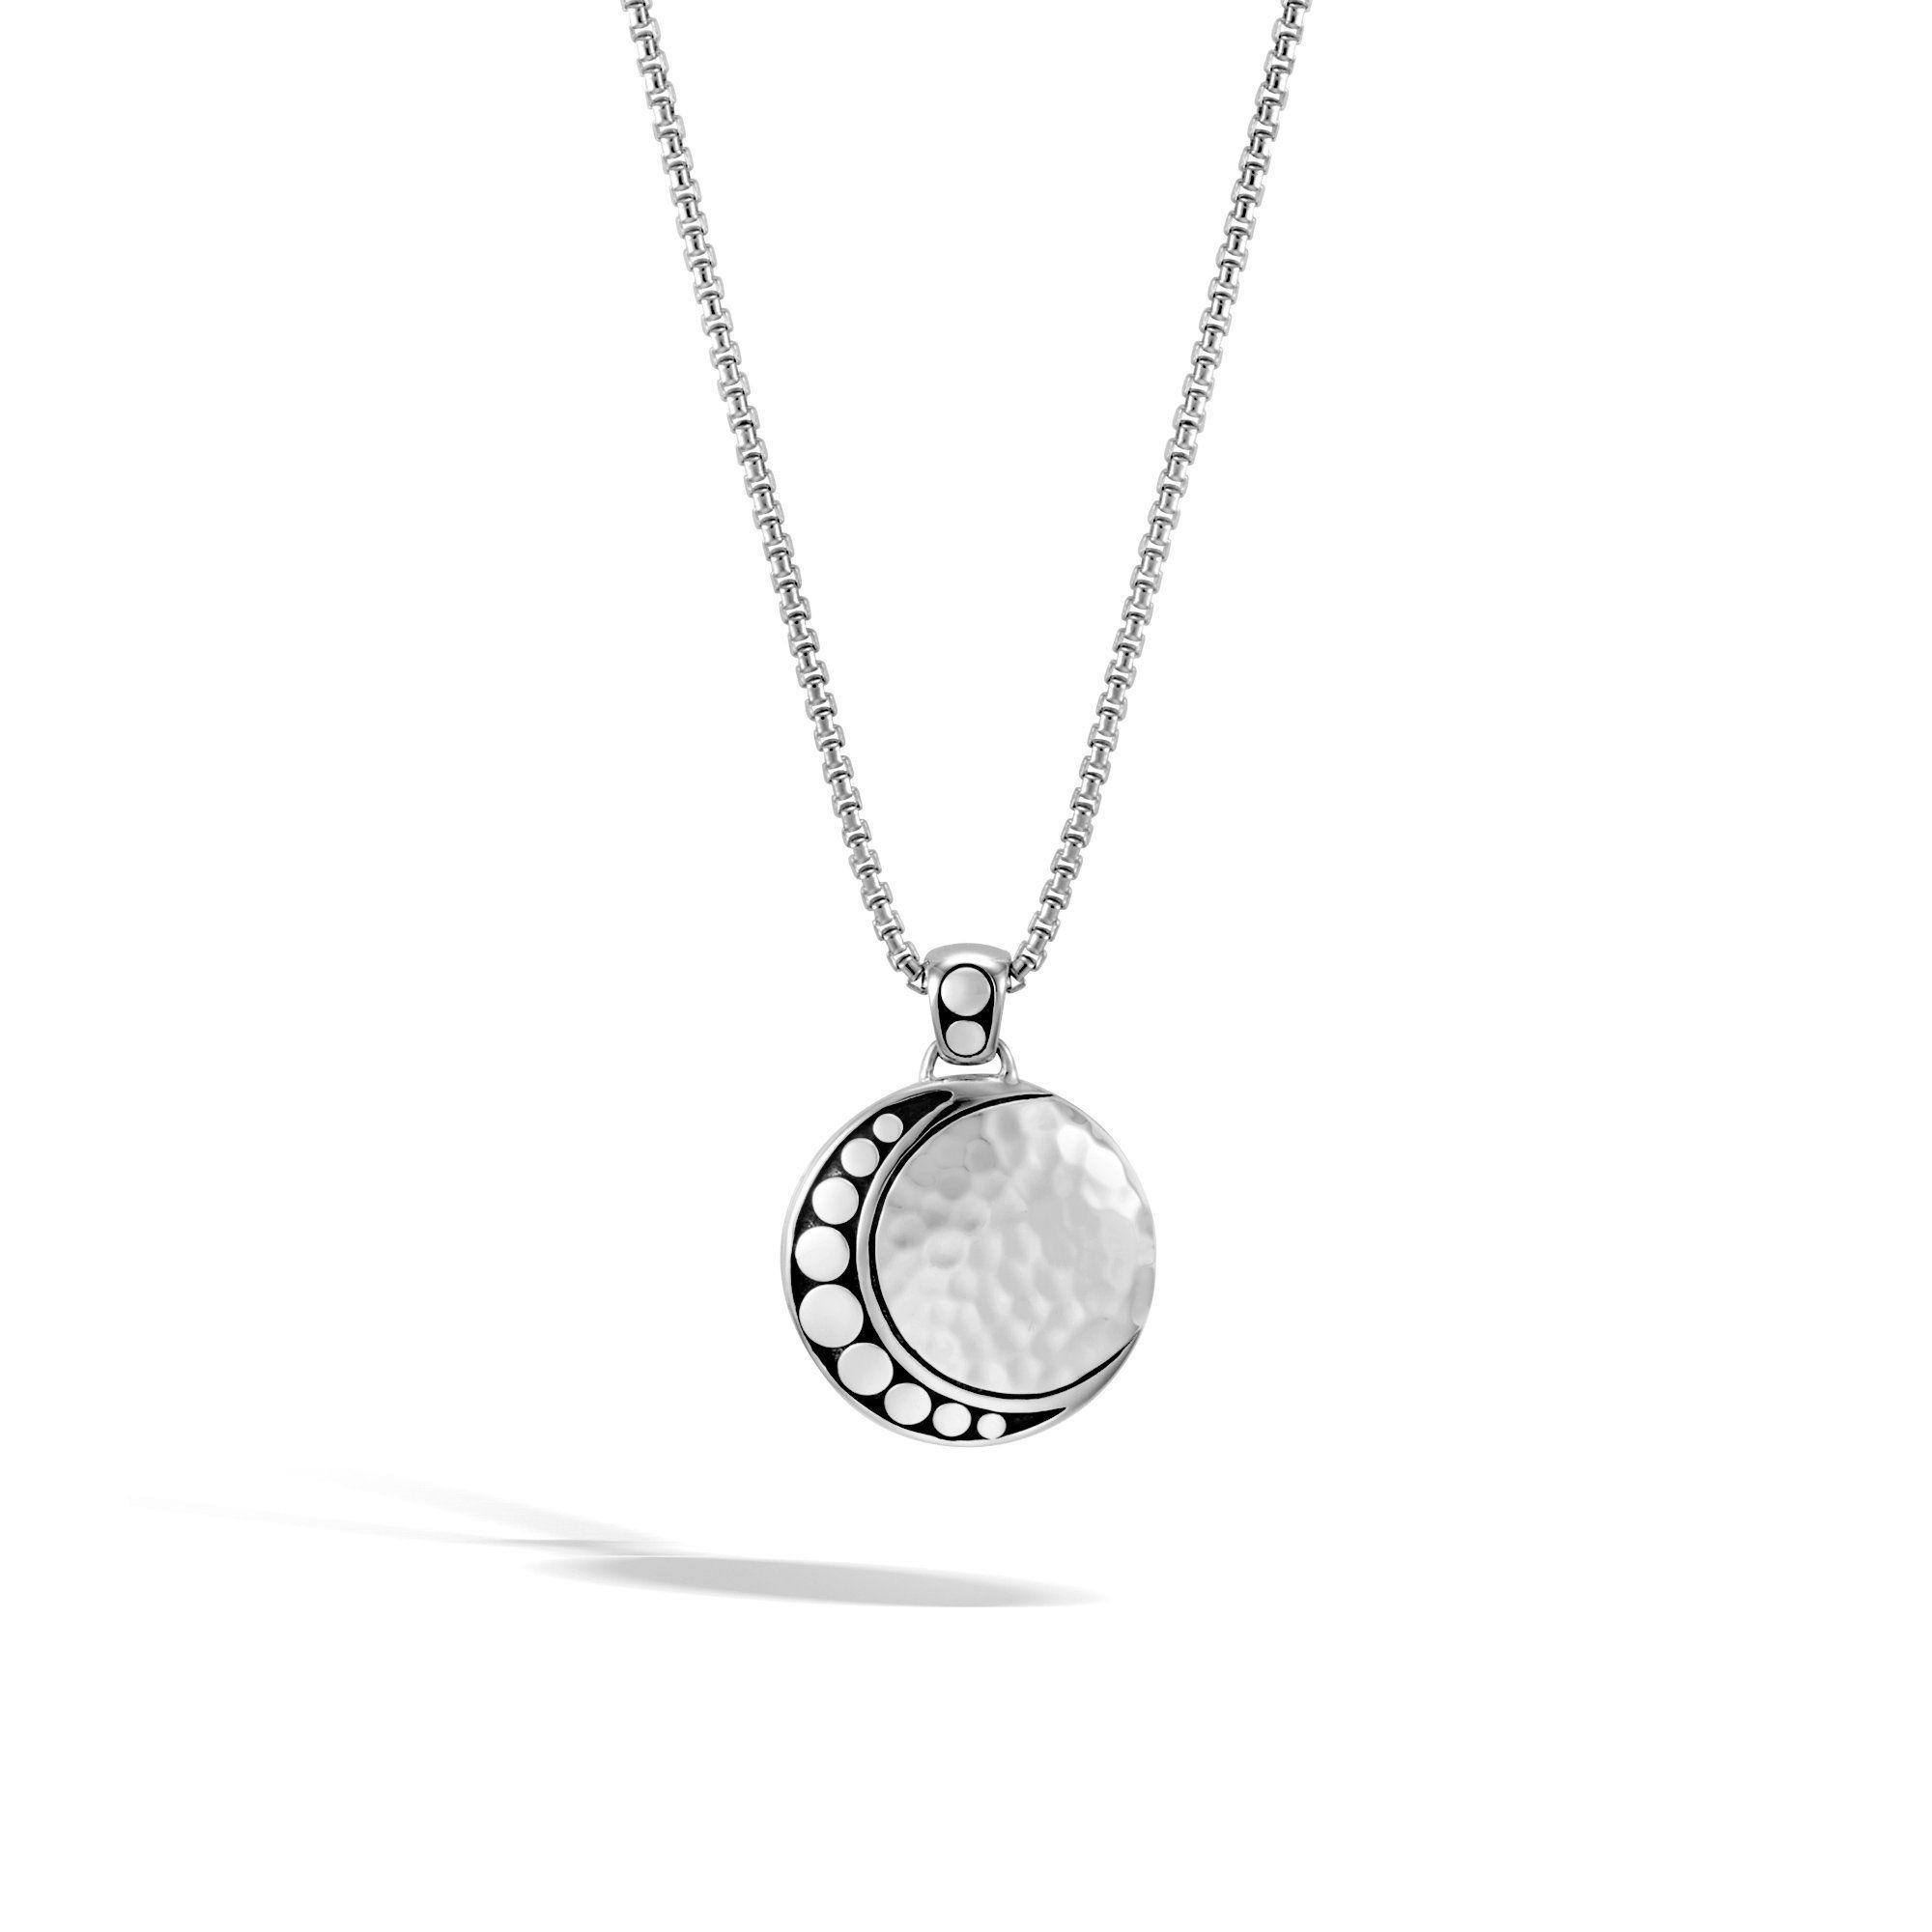 John Hardy Moon Phase Pendant Necklace With Diamonds u8oDIXIipv